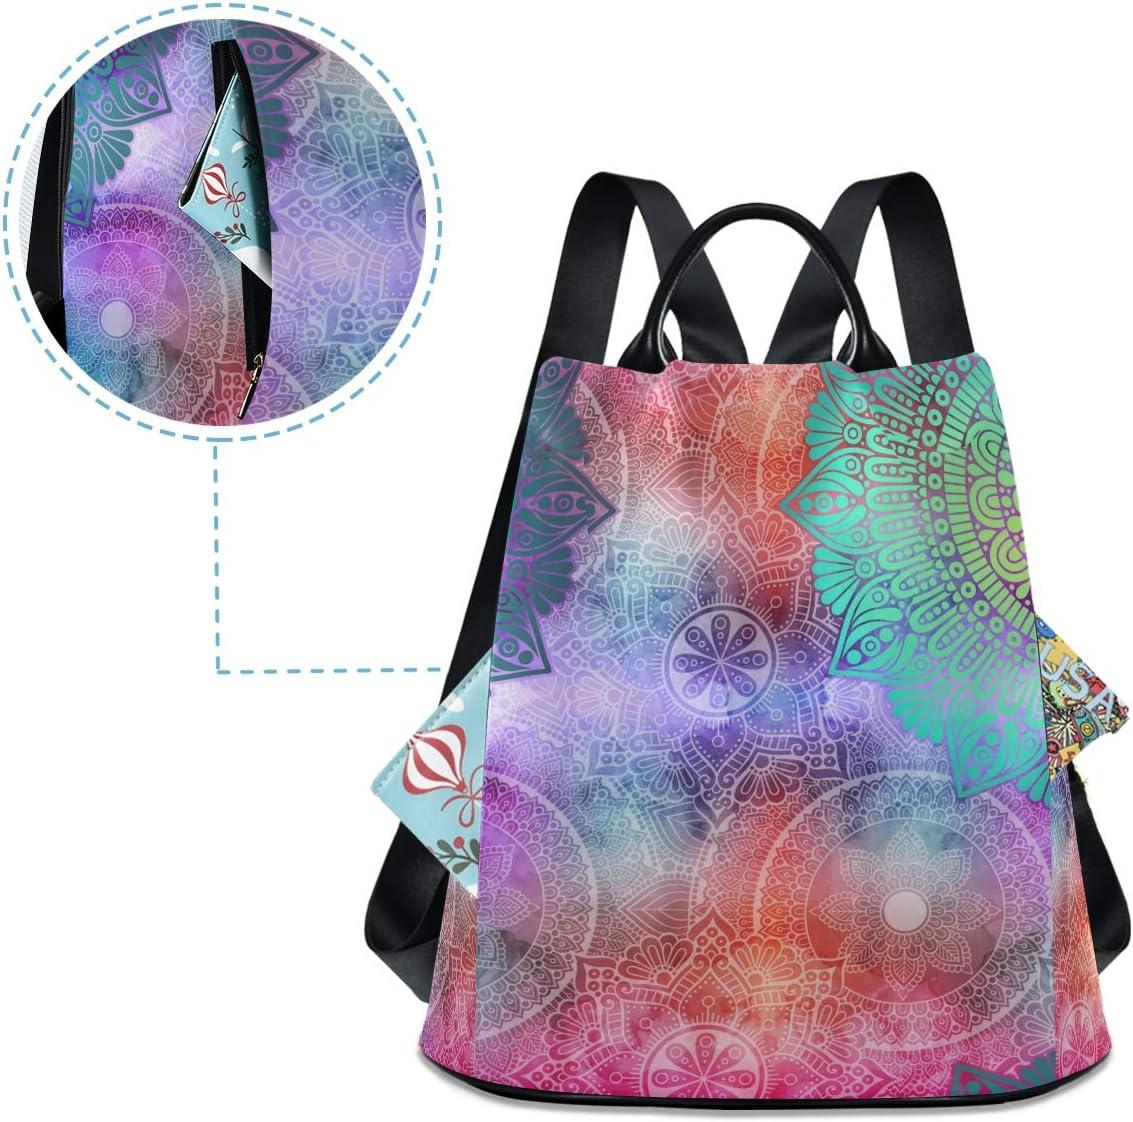 ALAZA Boho Mandalas Indian Print Decorative Backpack Purse for Women Anti Theft Fashion Back Pack Shoulder Bag